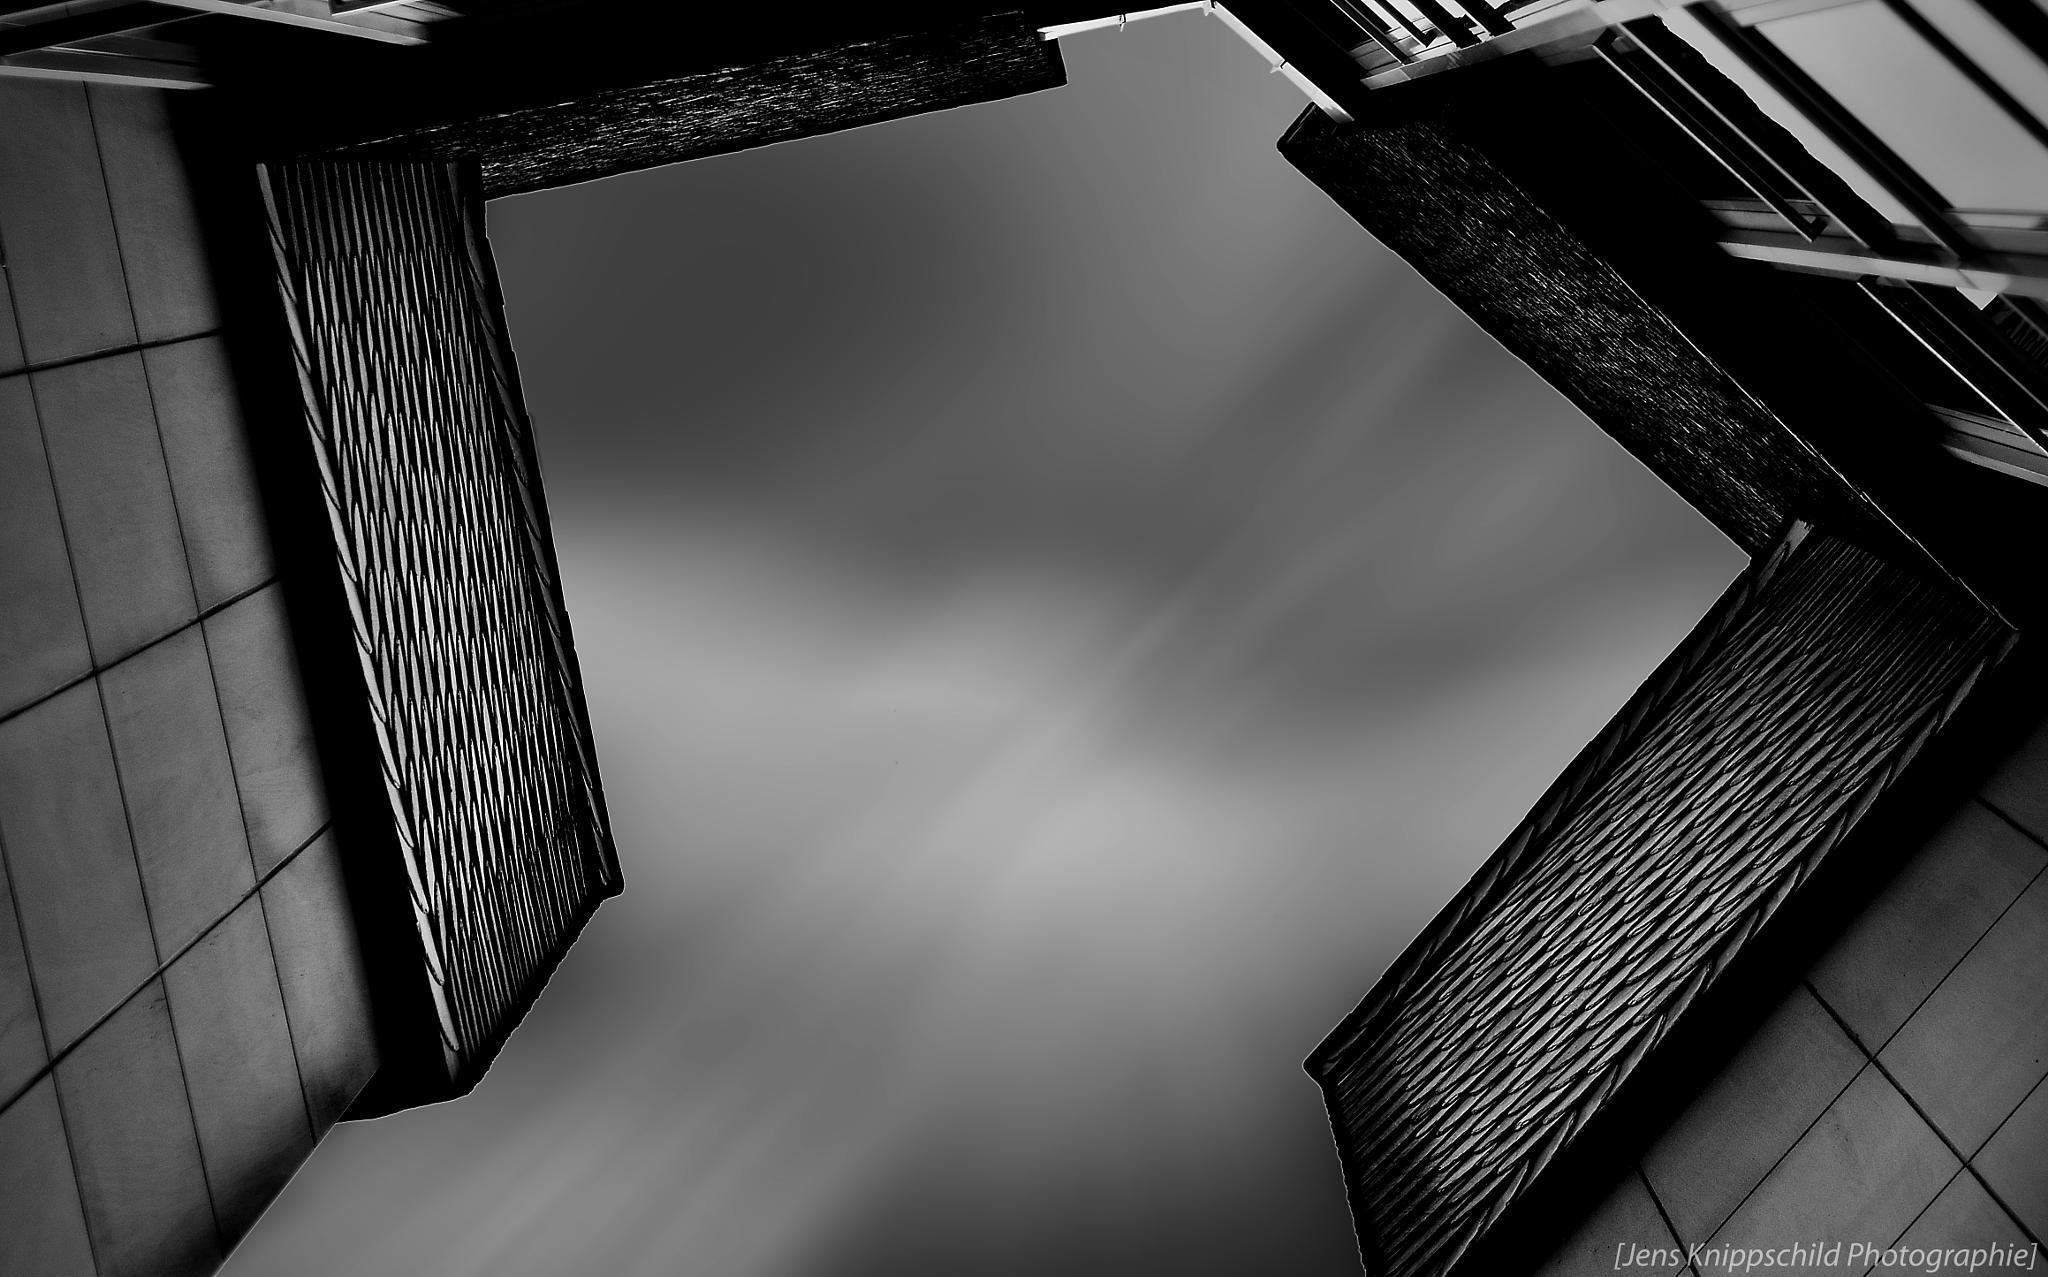 Exit by Jens Knippschild